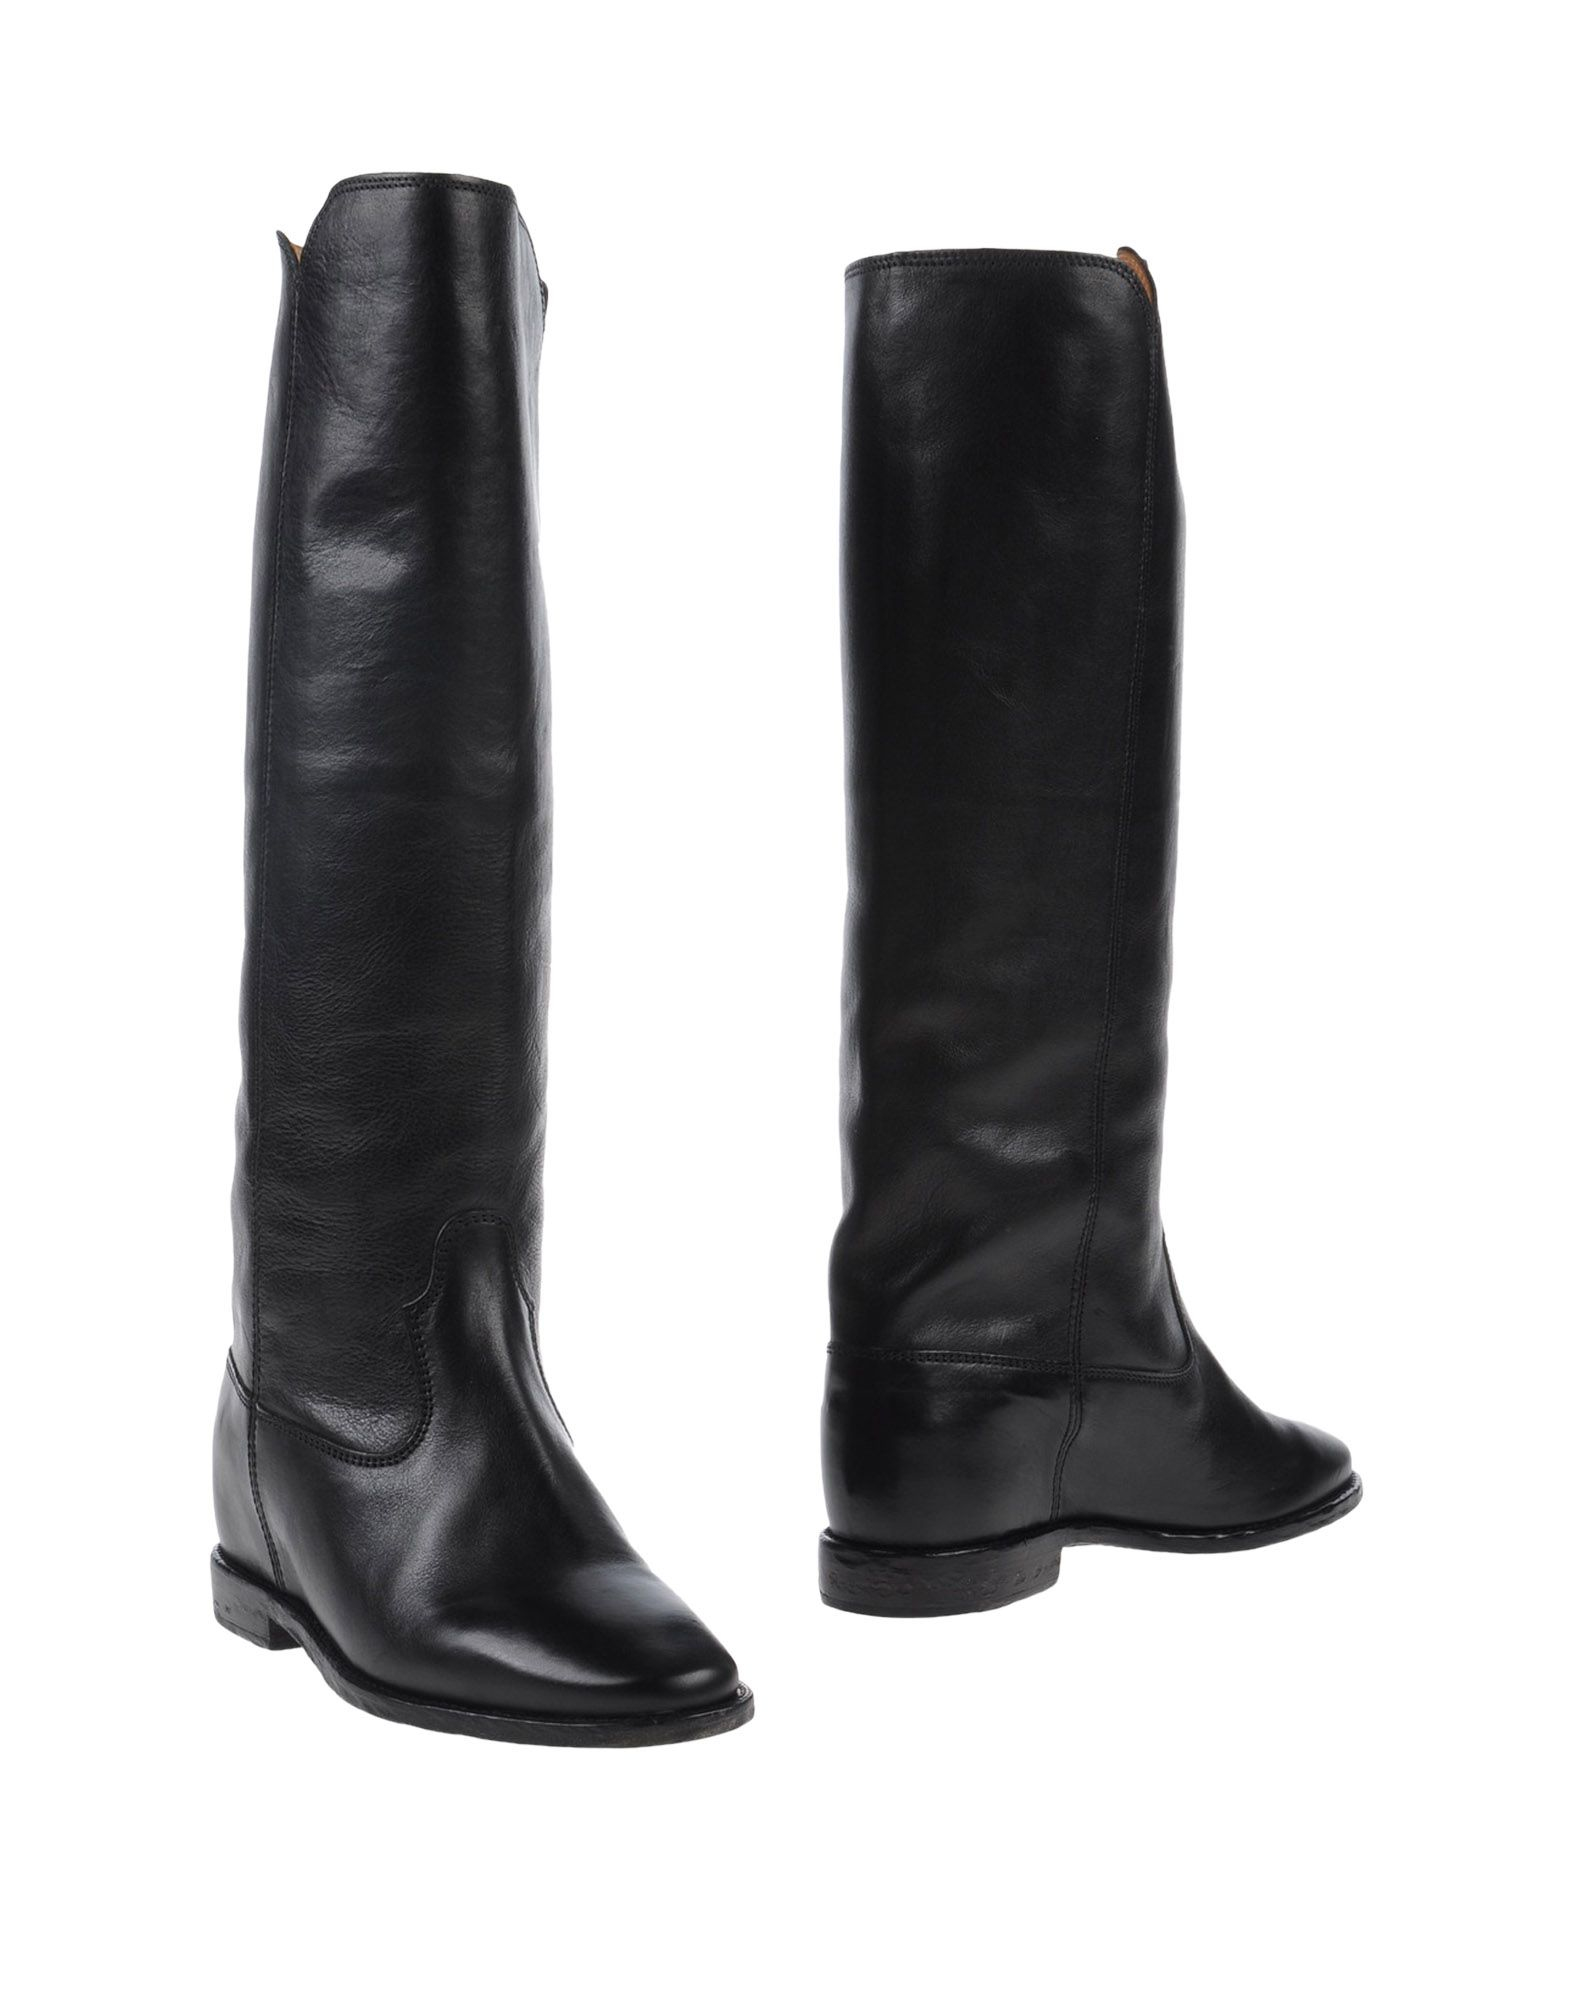 toile isabel marant boots in black lyst. Black Bedroom Furniture Sets. Home Design Ideas